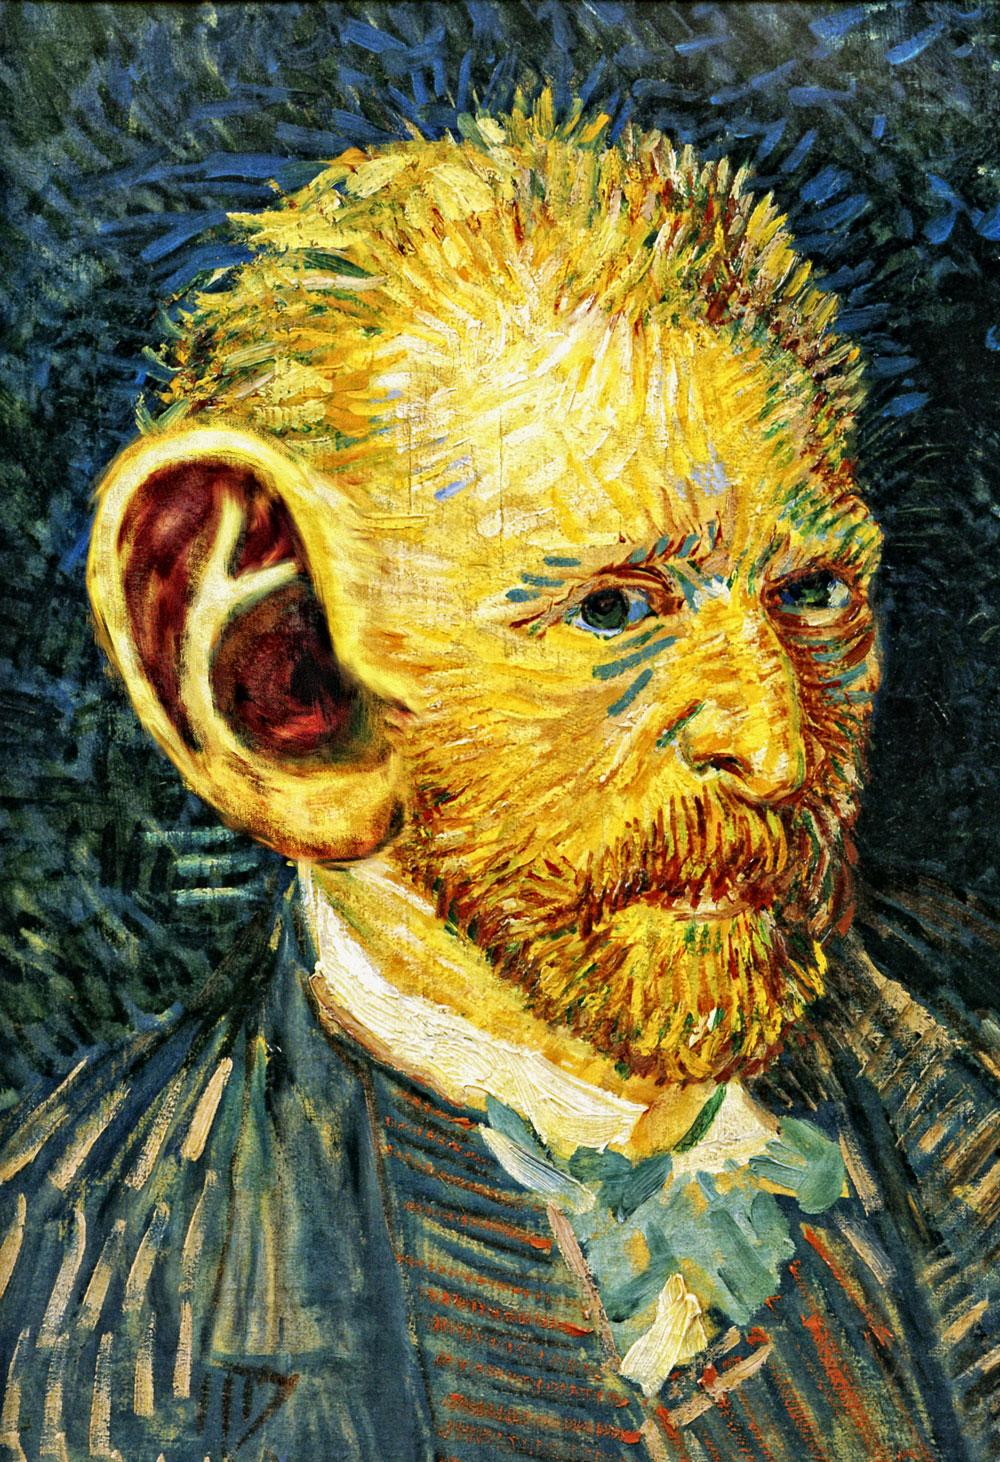 L 39 oreille coupee de van gogh mo cani l 39 od onie - Vincent van gogh autoportrait a l oreille coupee ...